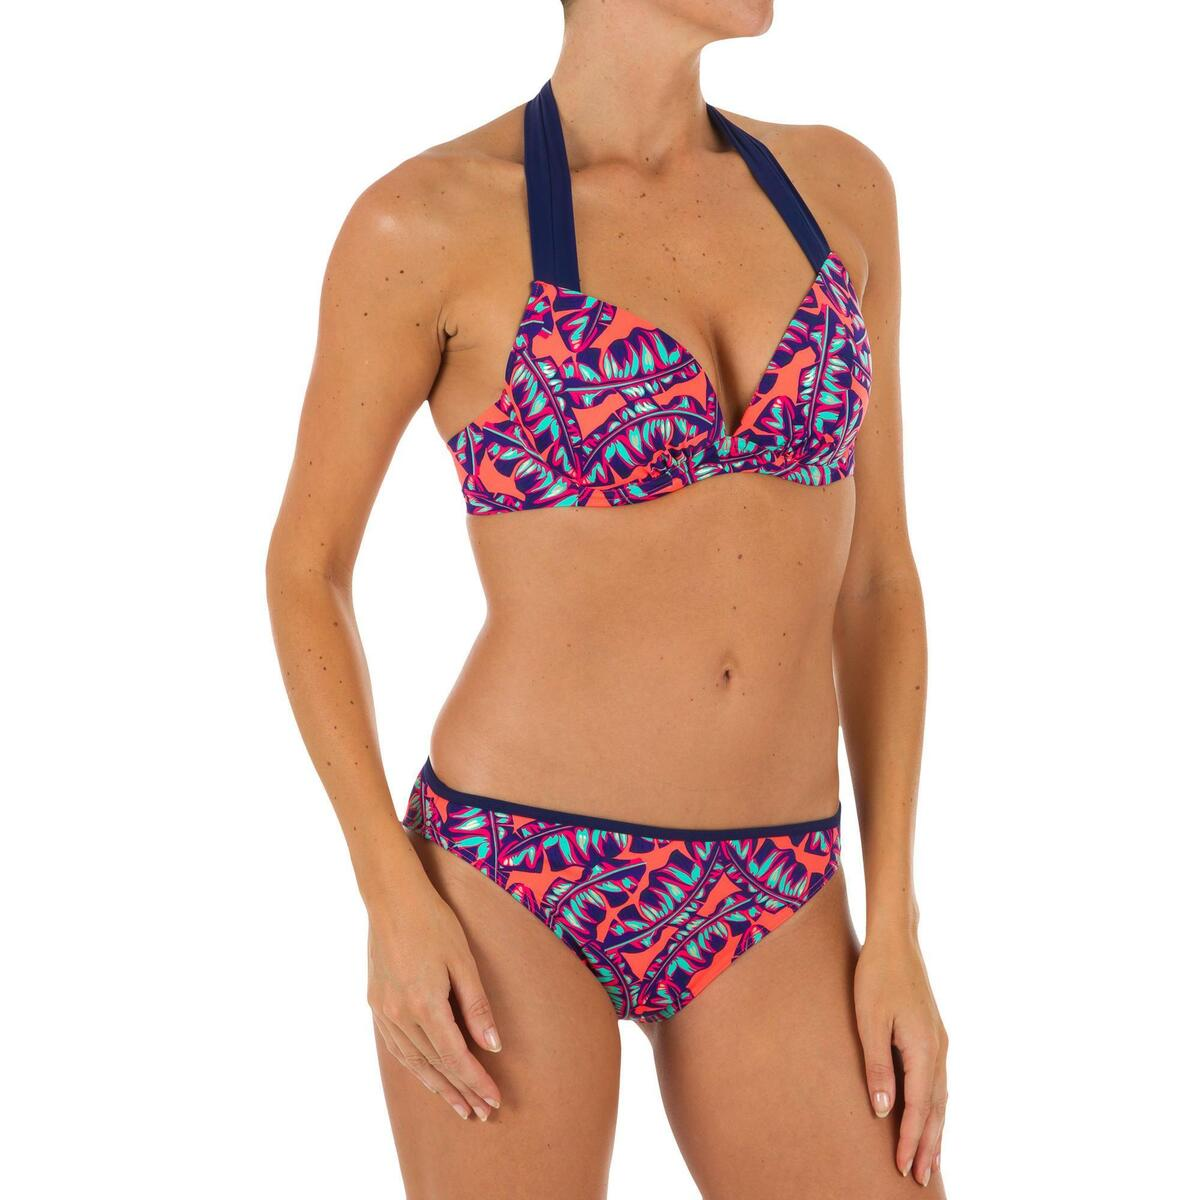 Bild 3 von Bikini-Hose Nina Domi Surfen klassische Form Damen